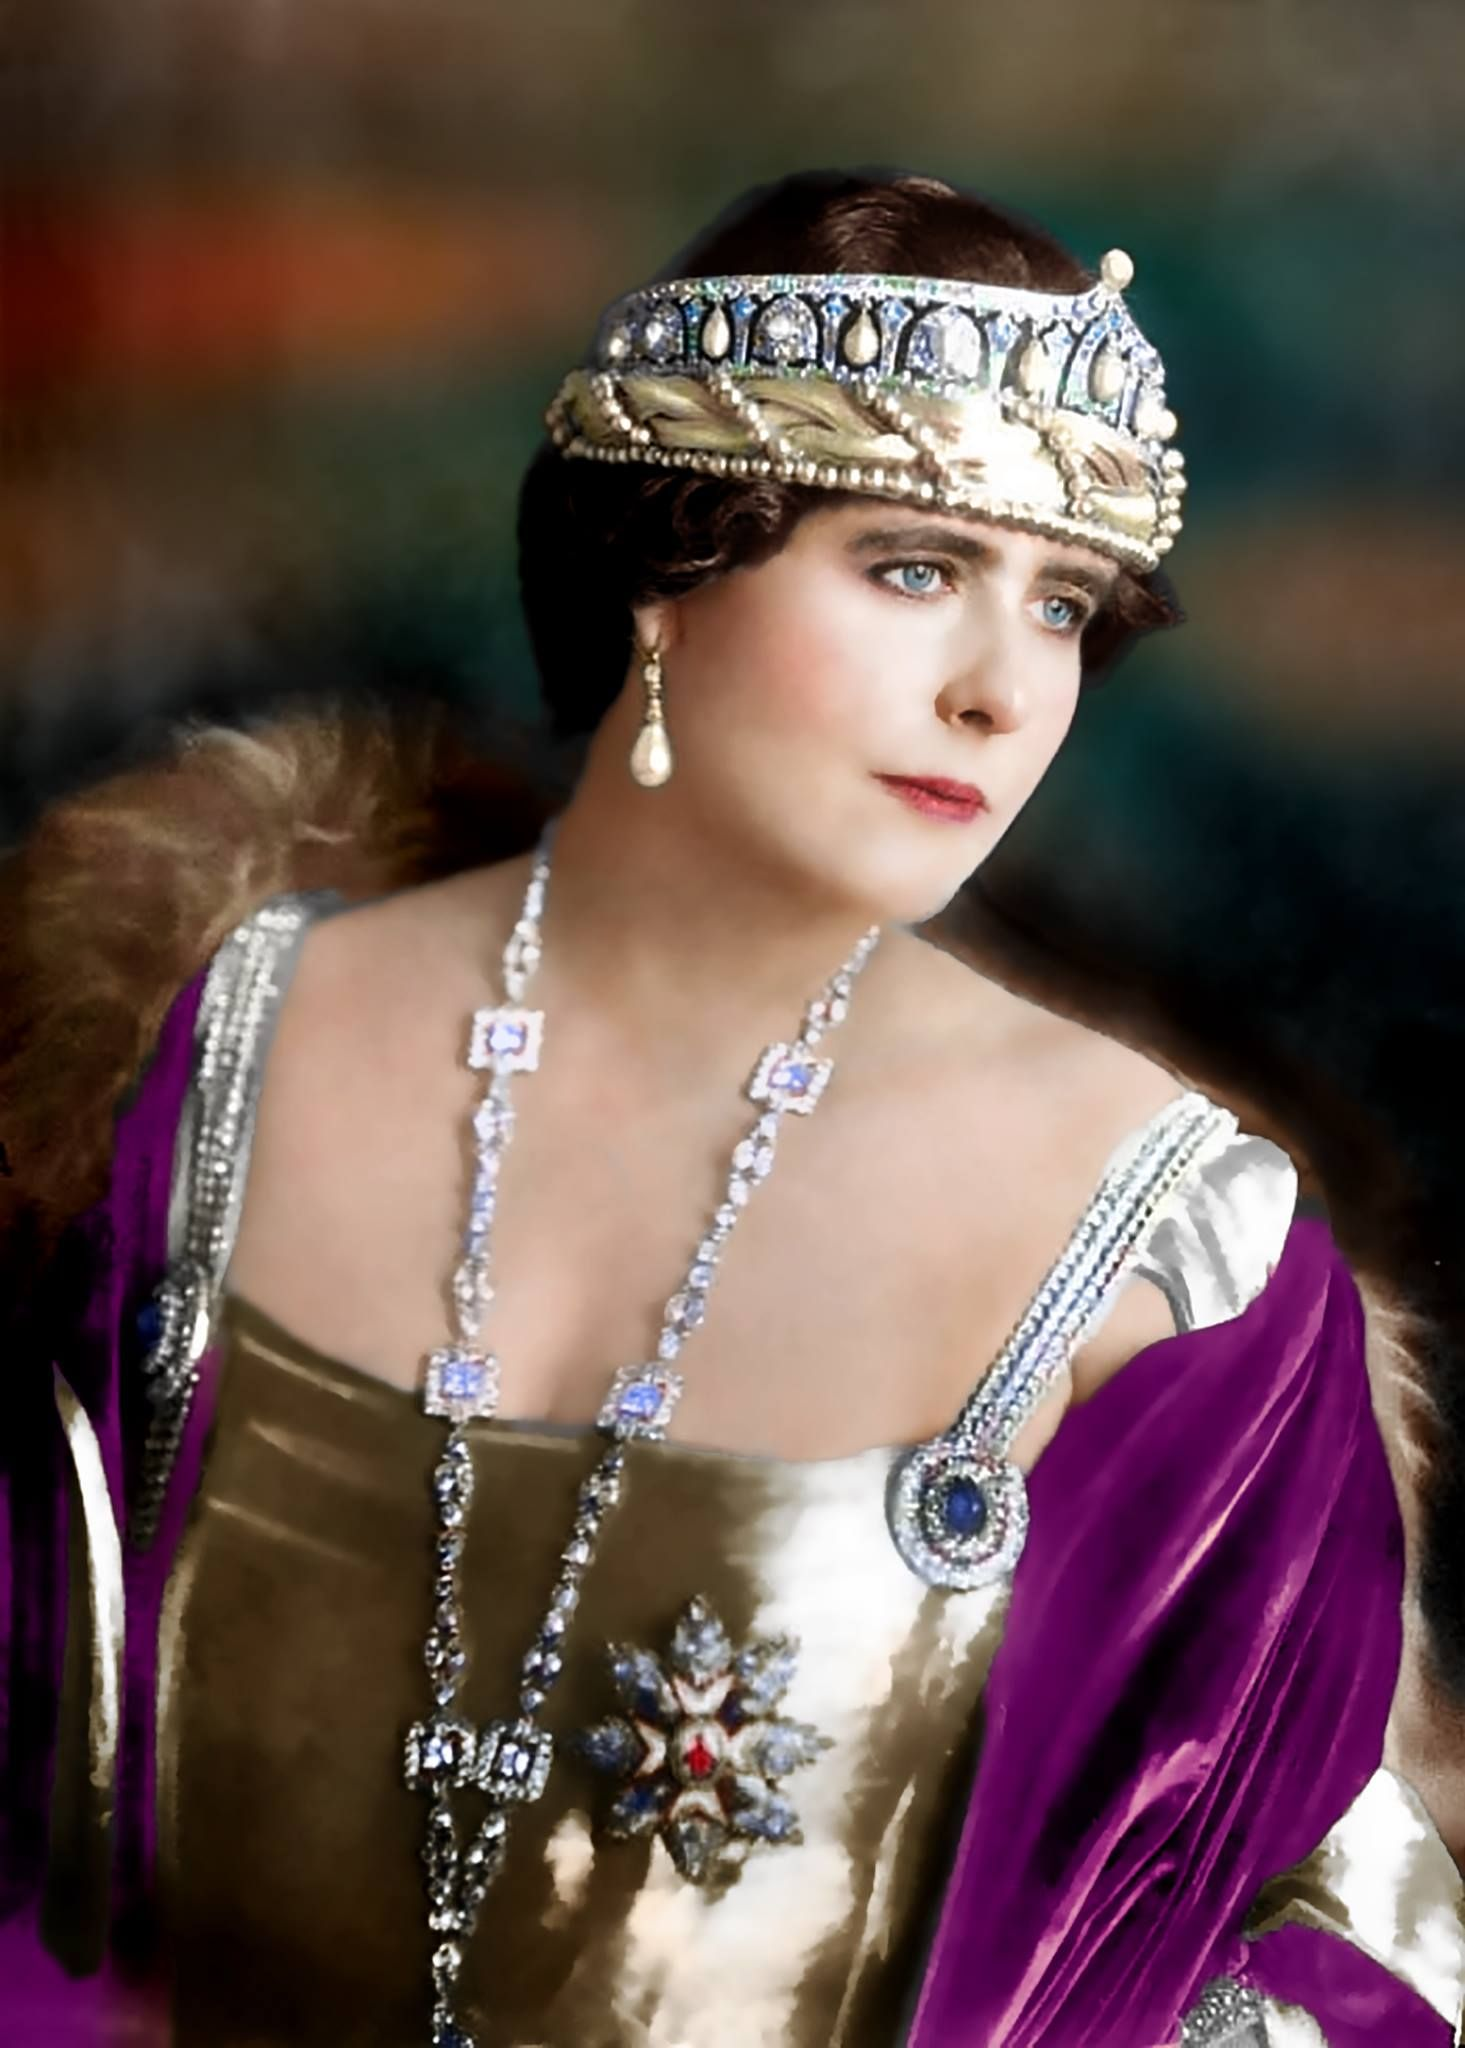 Imagini pentru regina maria